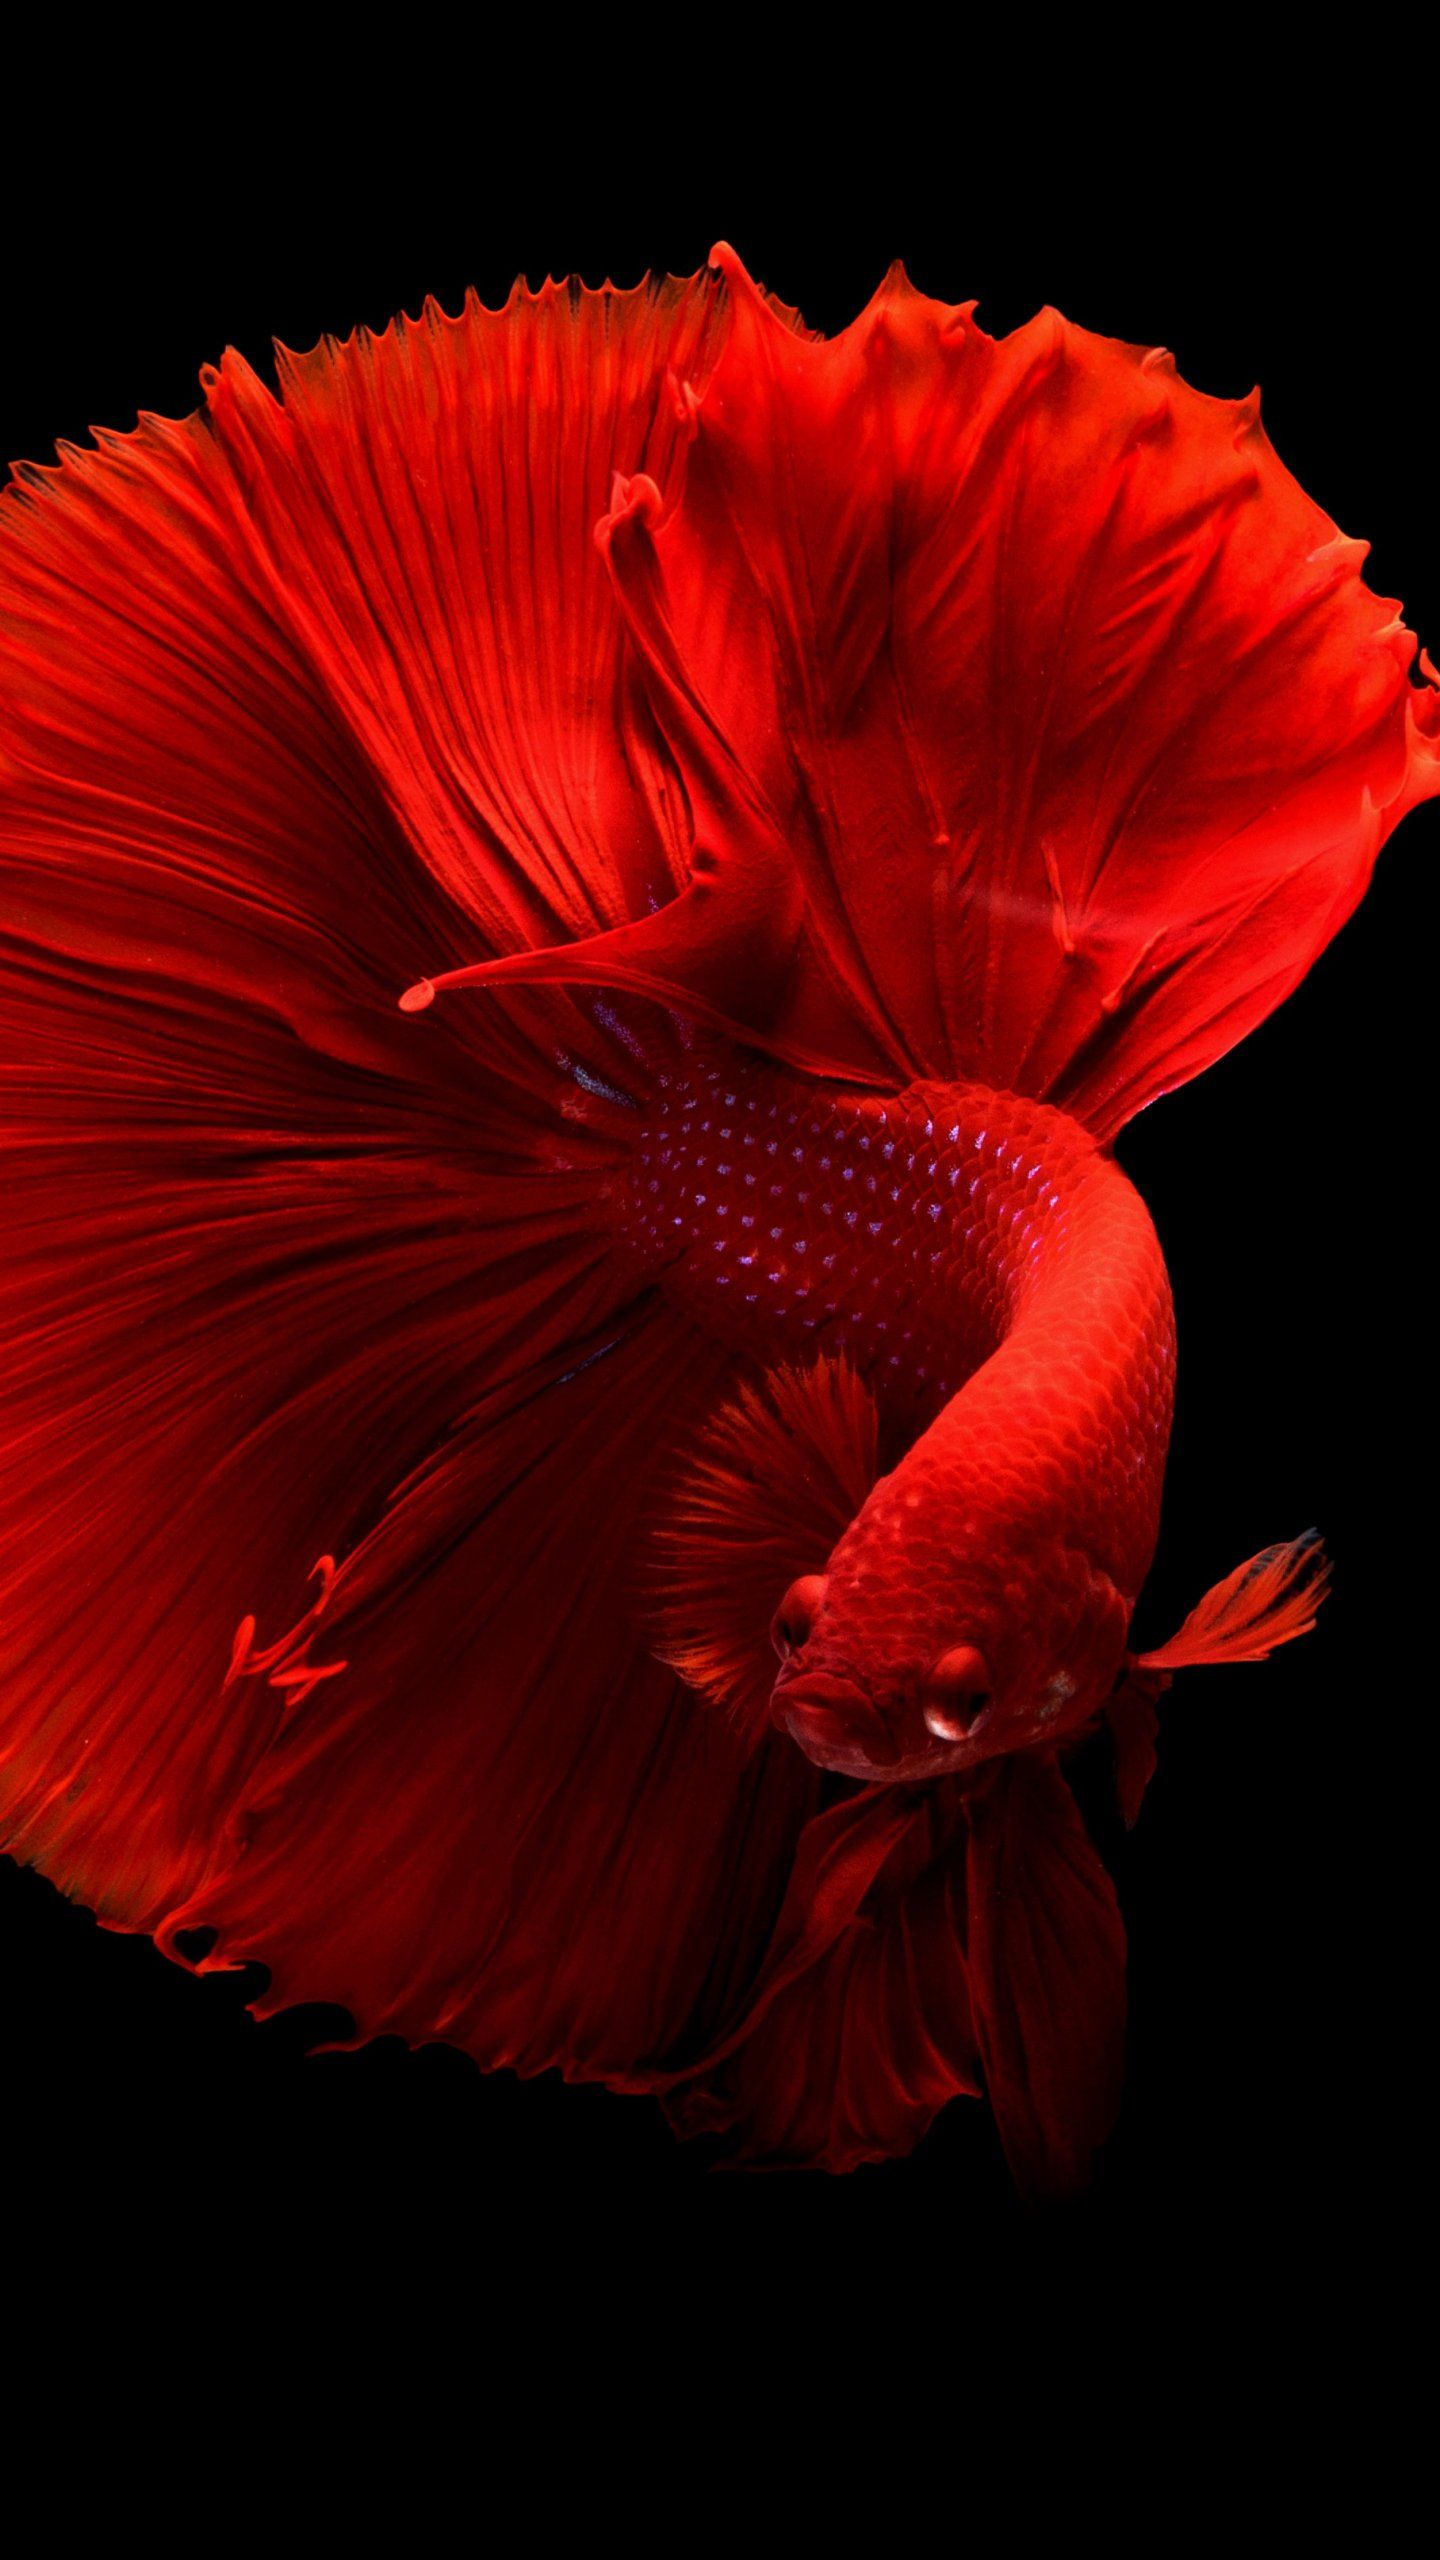 Siamese Fighting Fish Wallpaper Iphone Android Desktop Backgrounds Betta Ikan Cupang Binatang